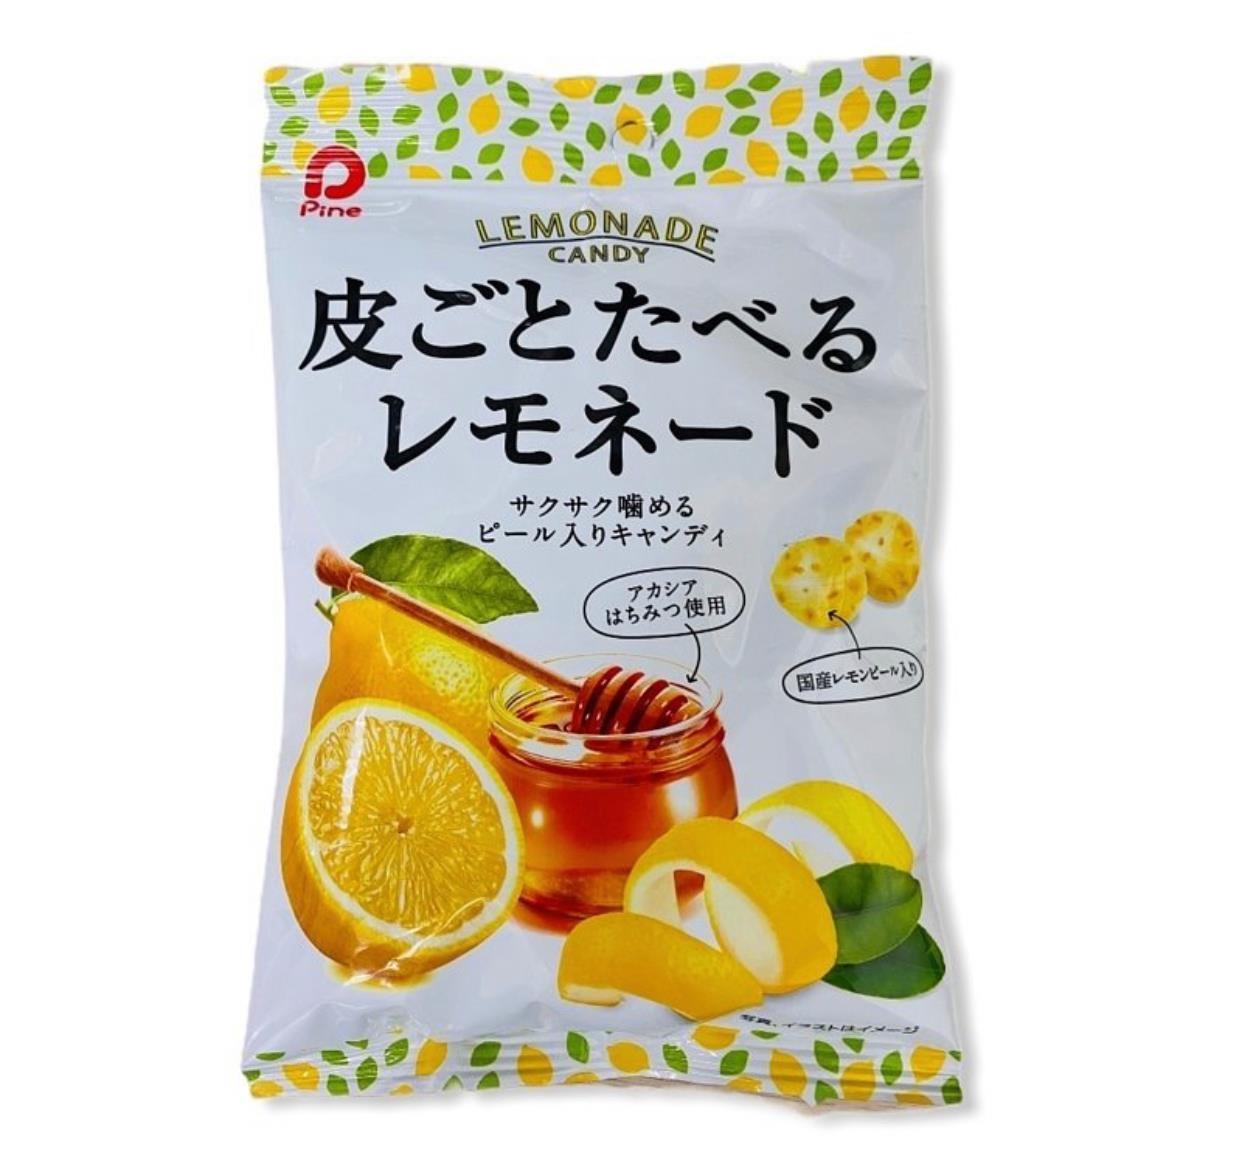 Pine派恩 帶皮檸檬蜂蜜糖 81g